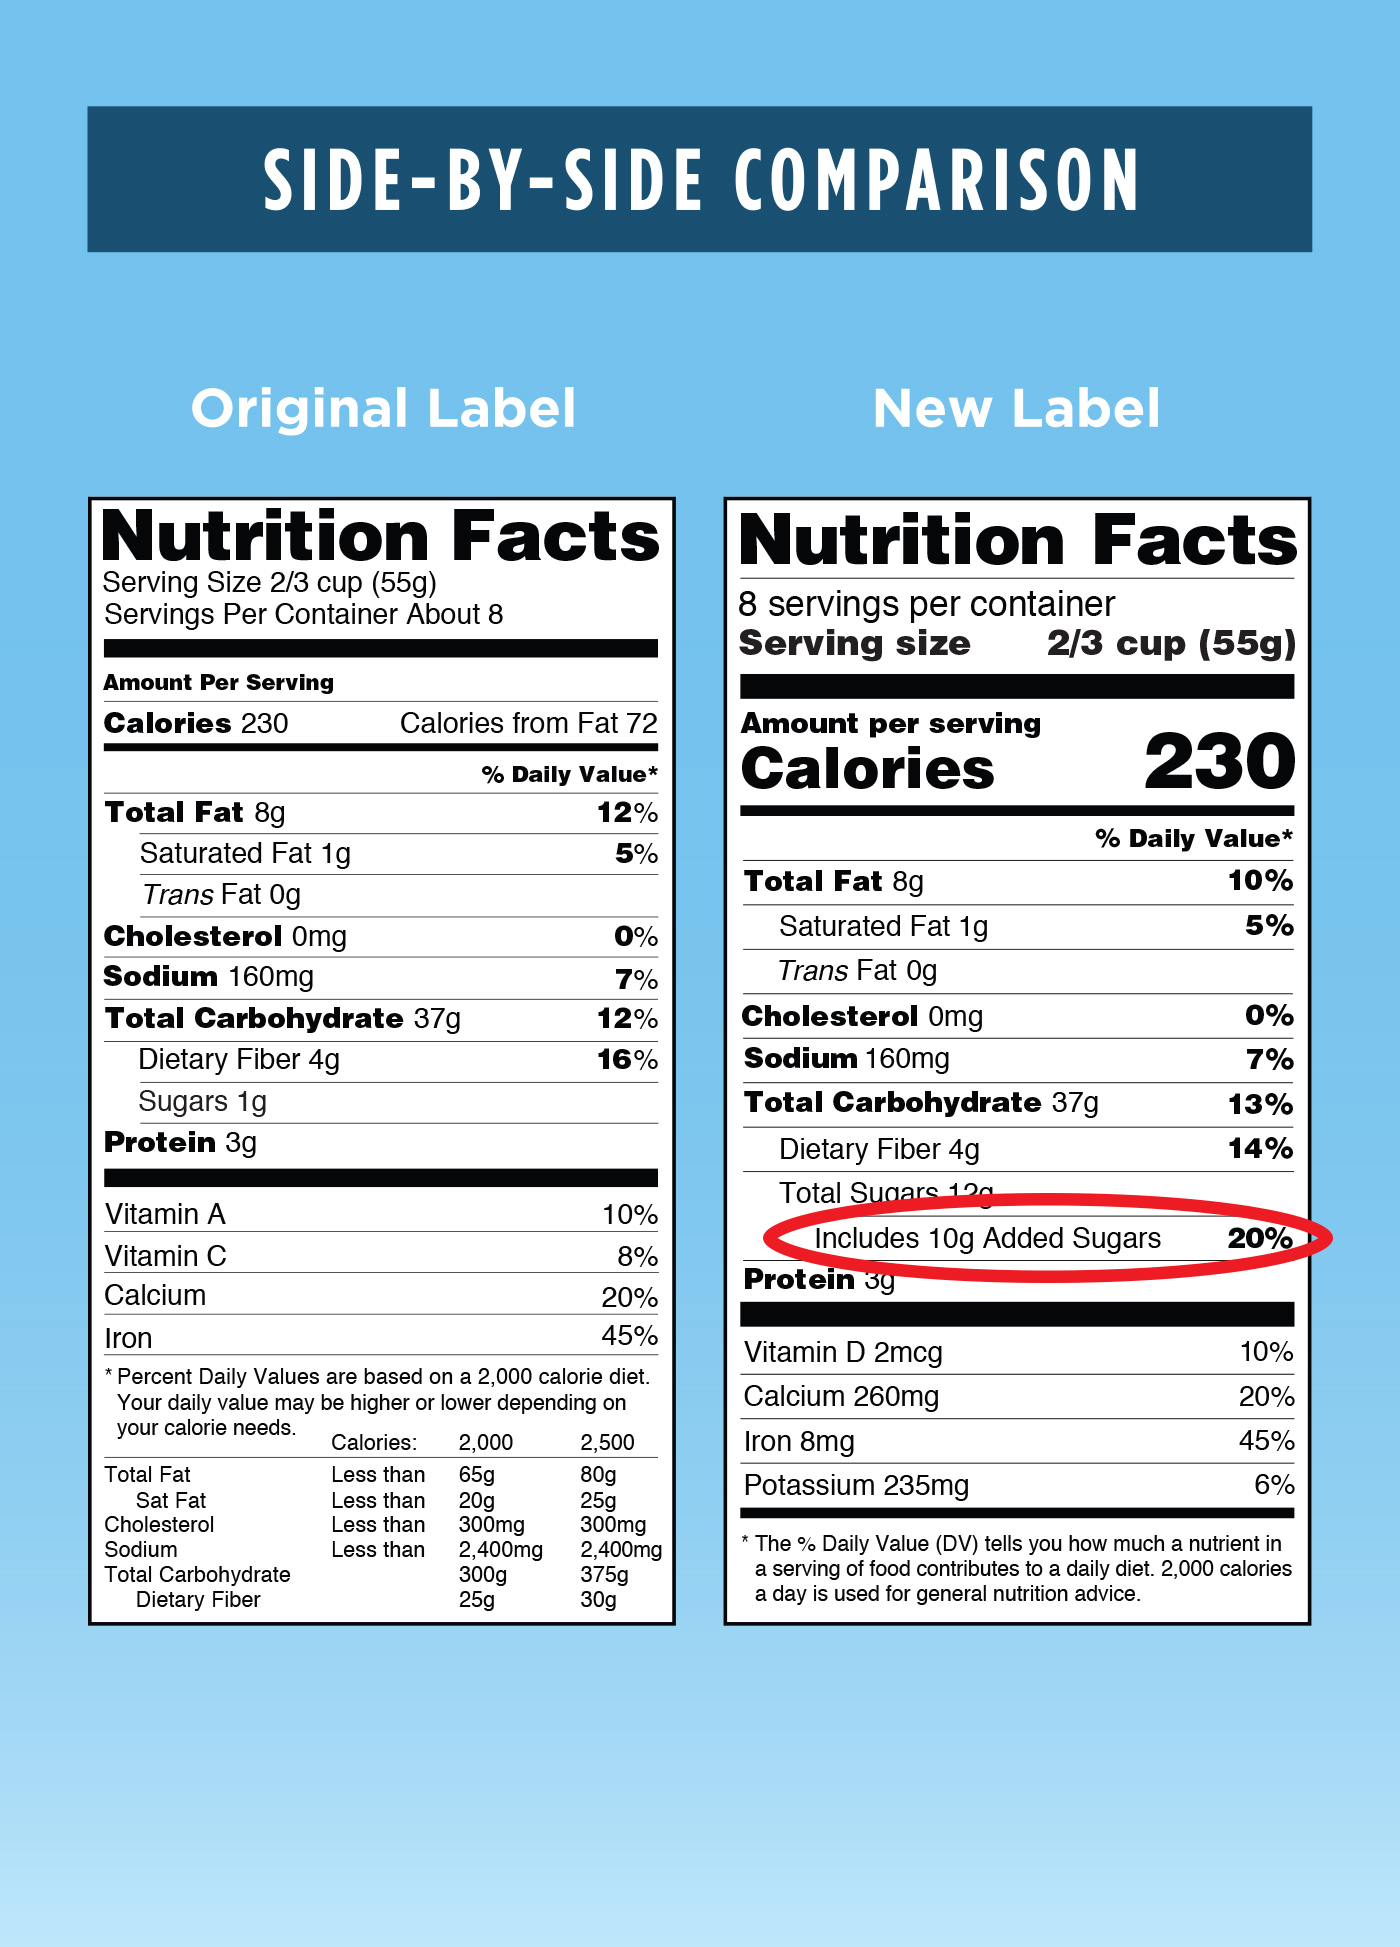 totol sugar intake for 2000 calorie diet